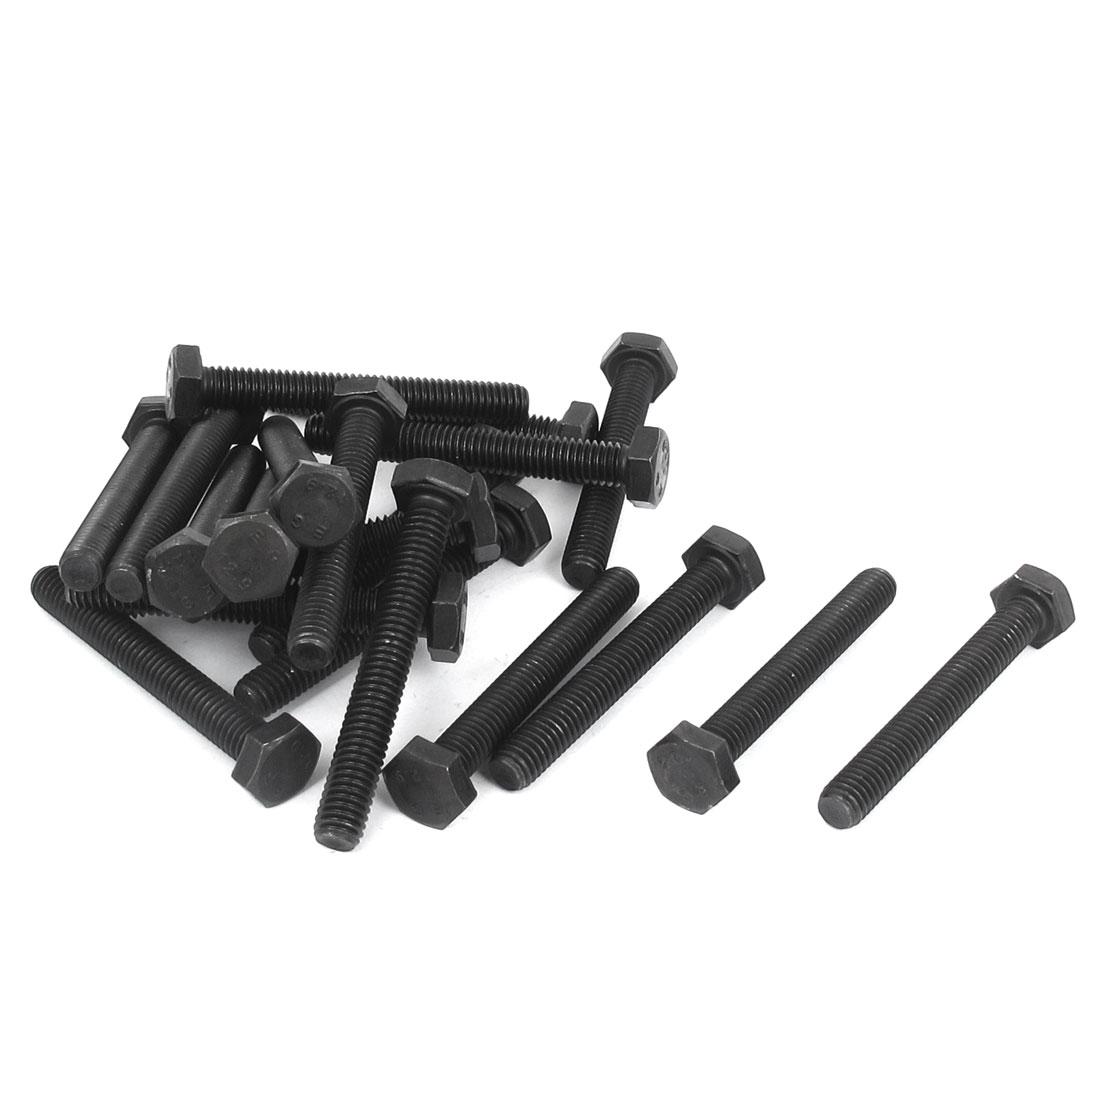 M6 x 45mm Full Thread Hexagonal Head Cap Screw Bolt Black 20 Pcs